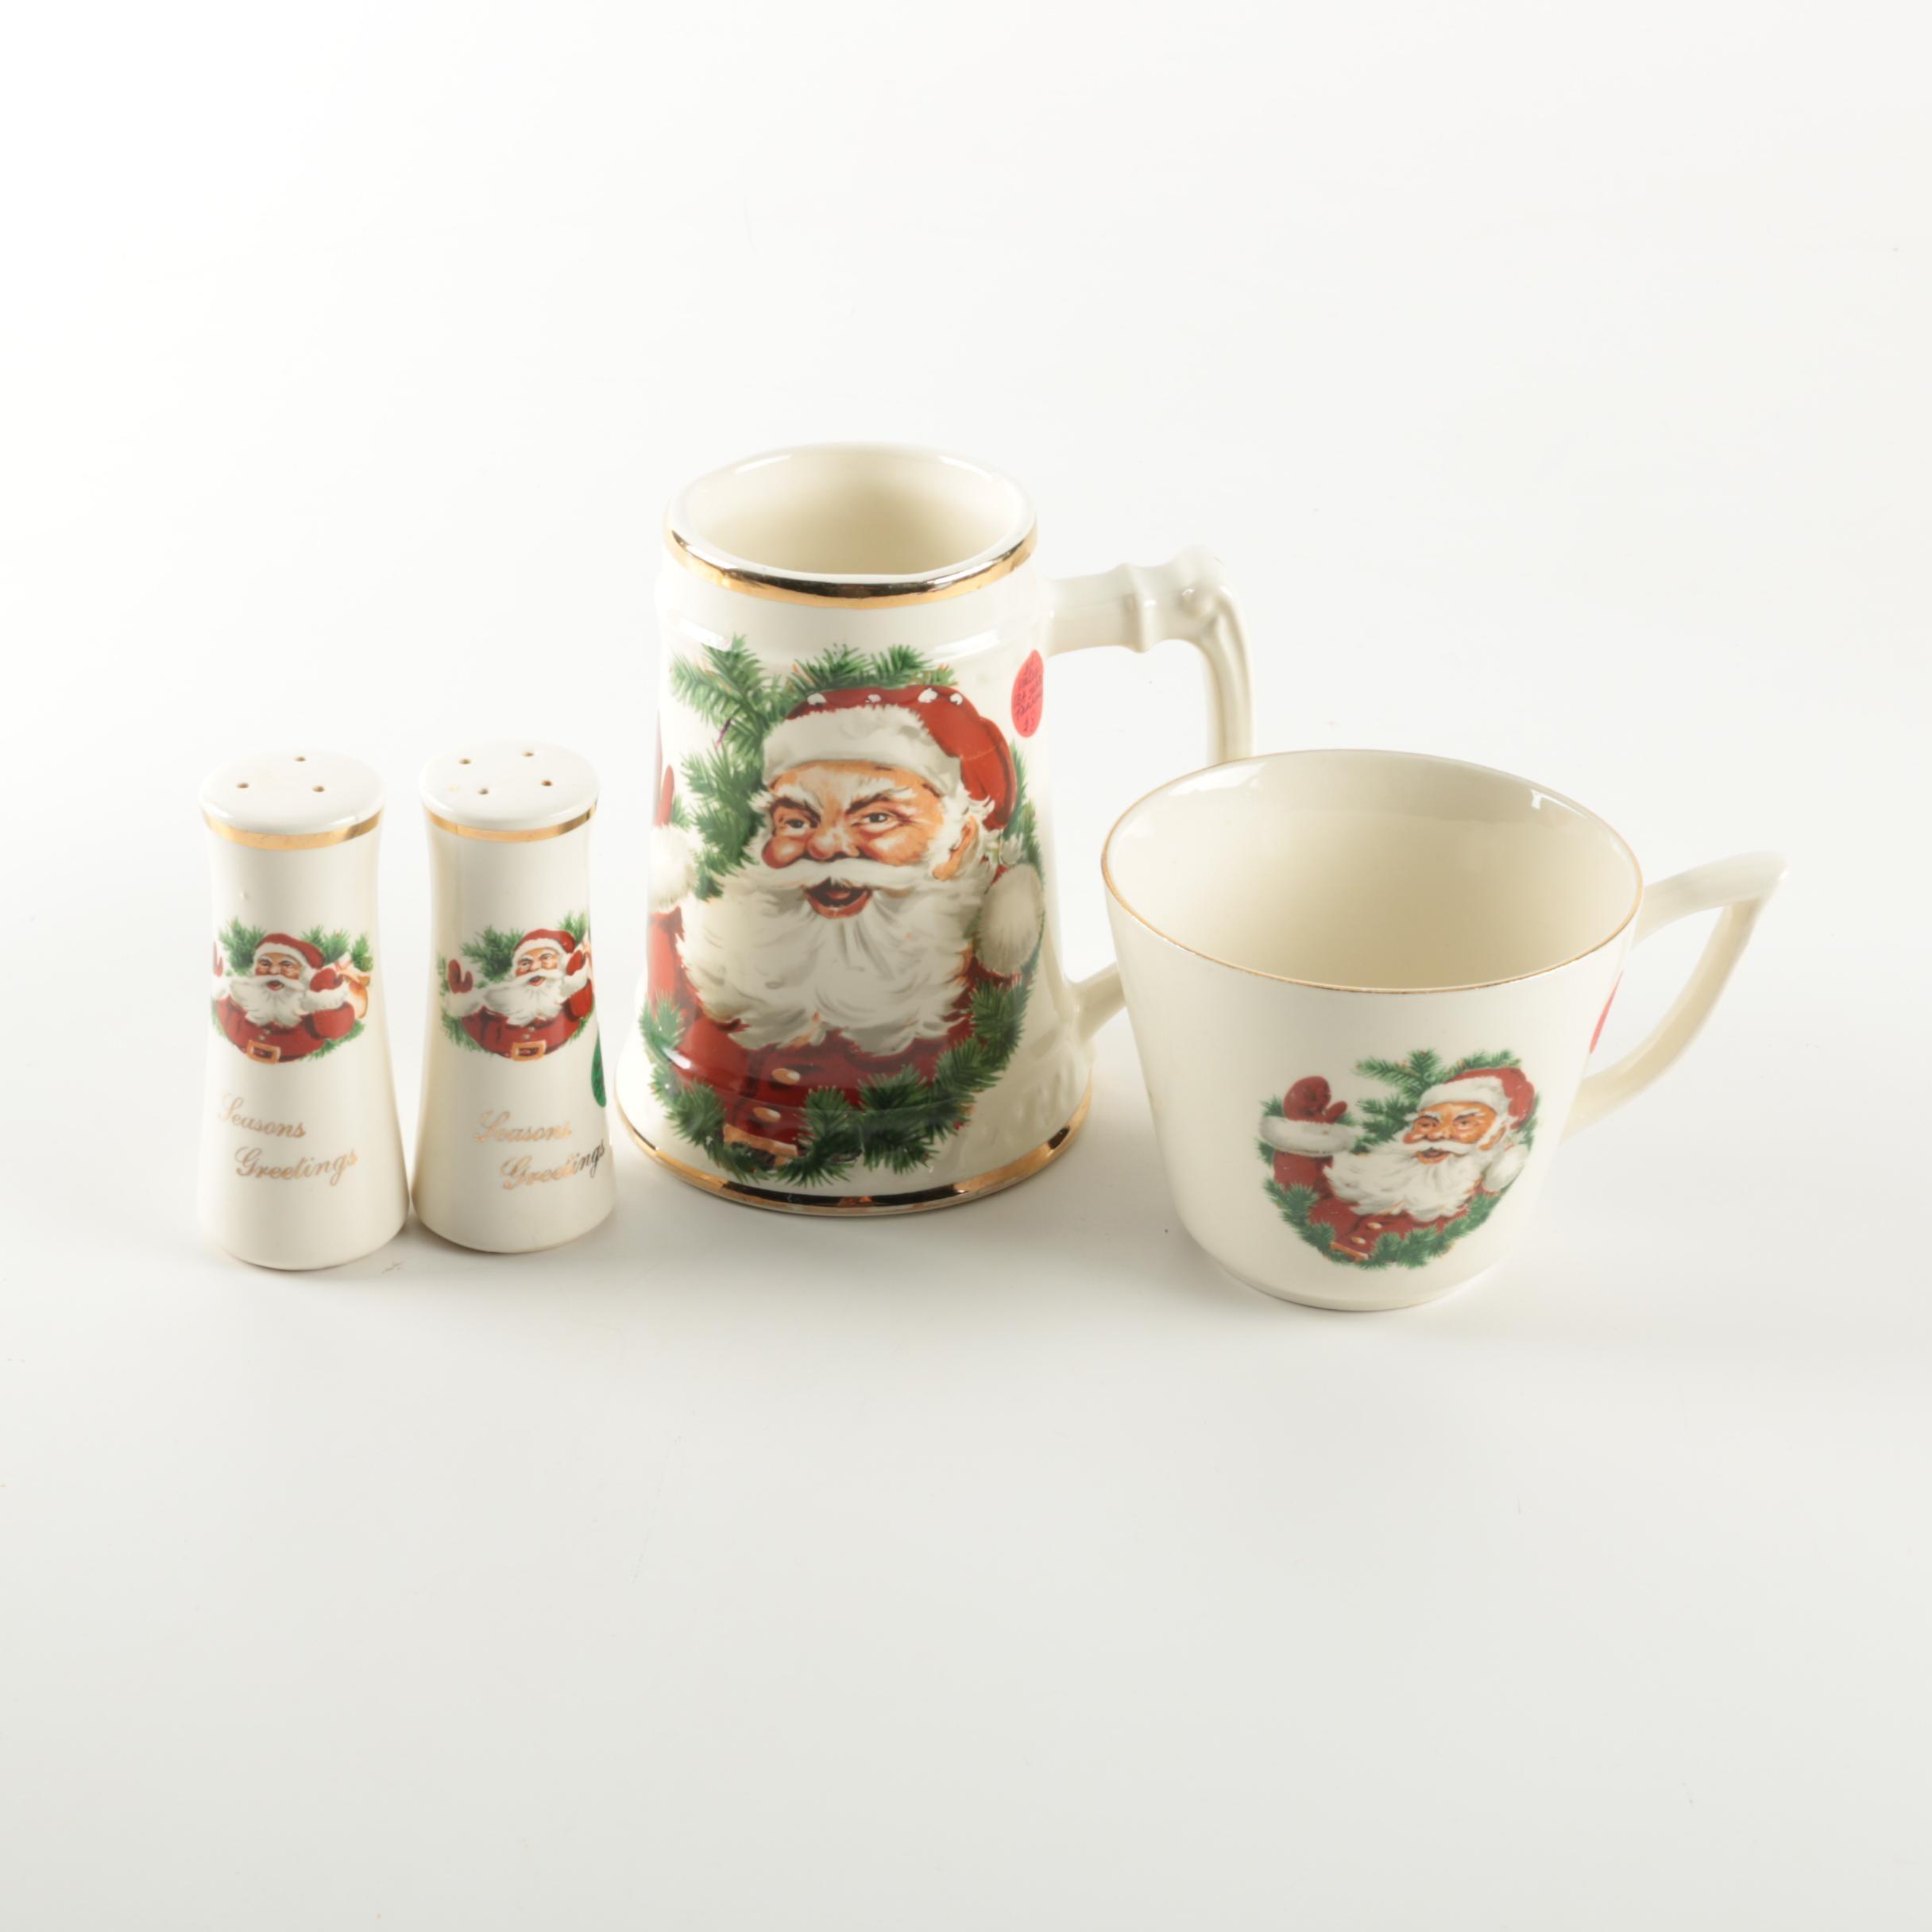 Vintage Santa-Themed Ceramic Tableware